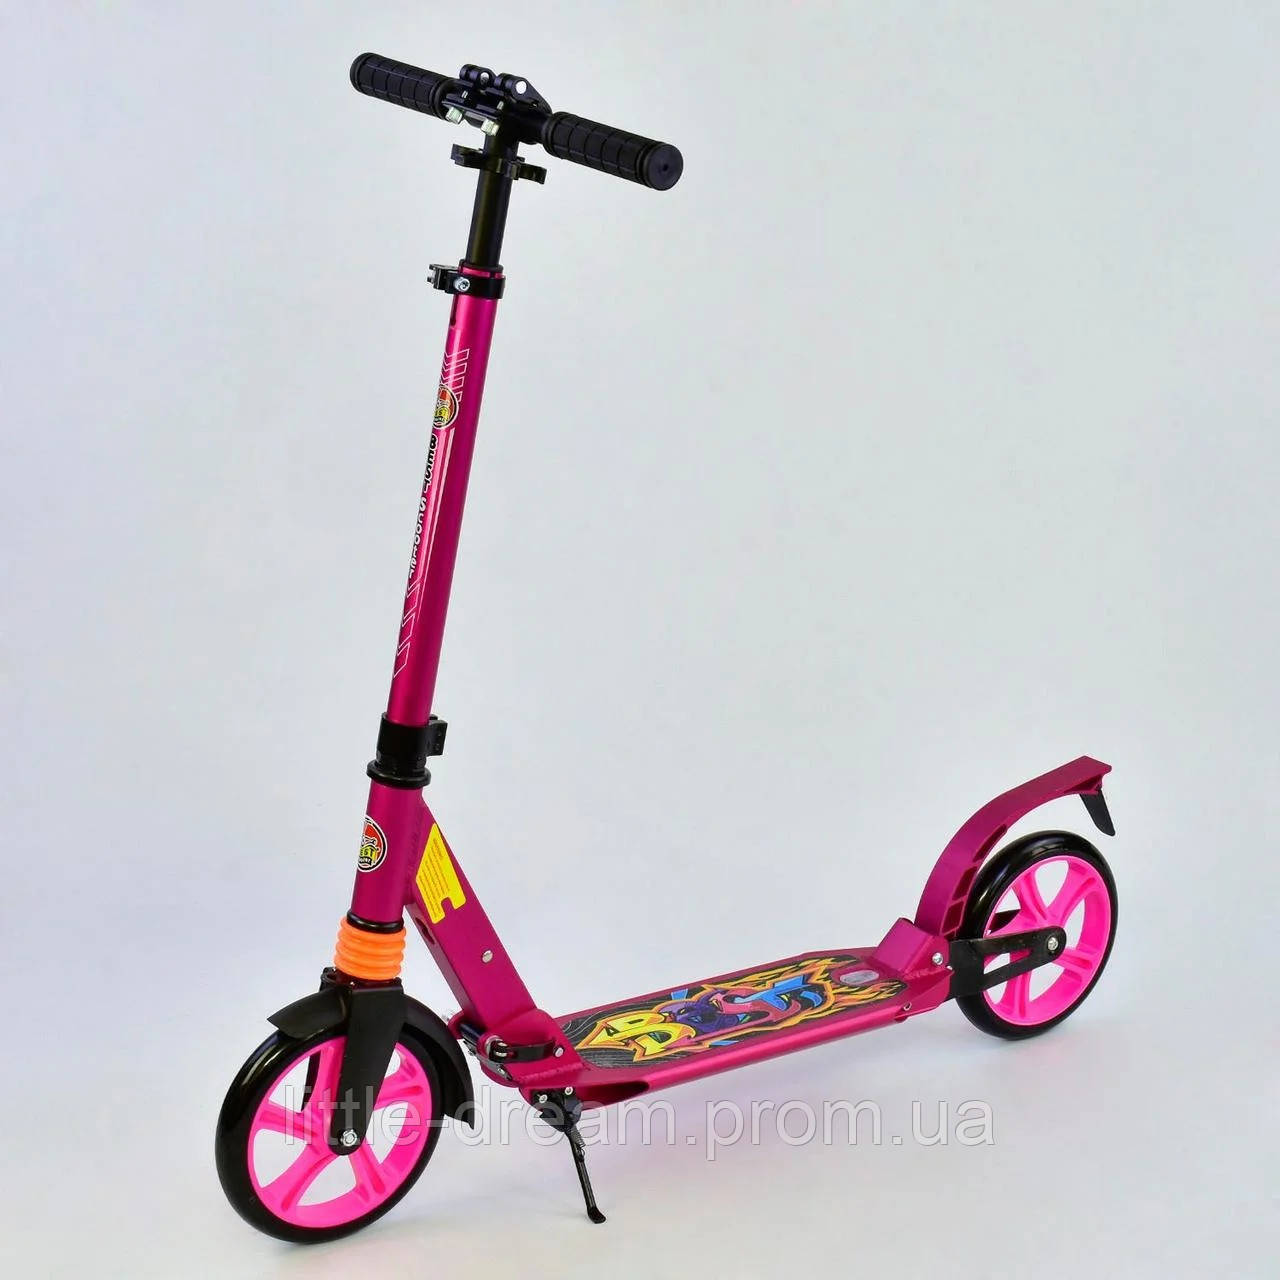 Самокат Best Scooter 00692, розовый